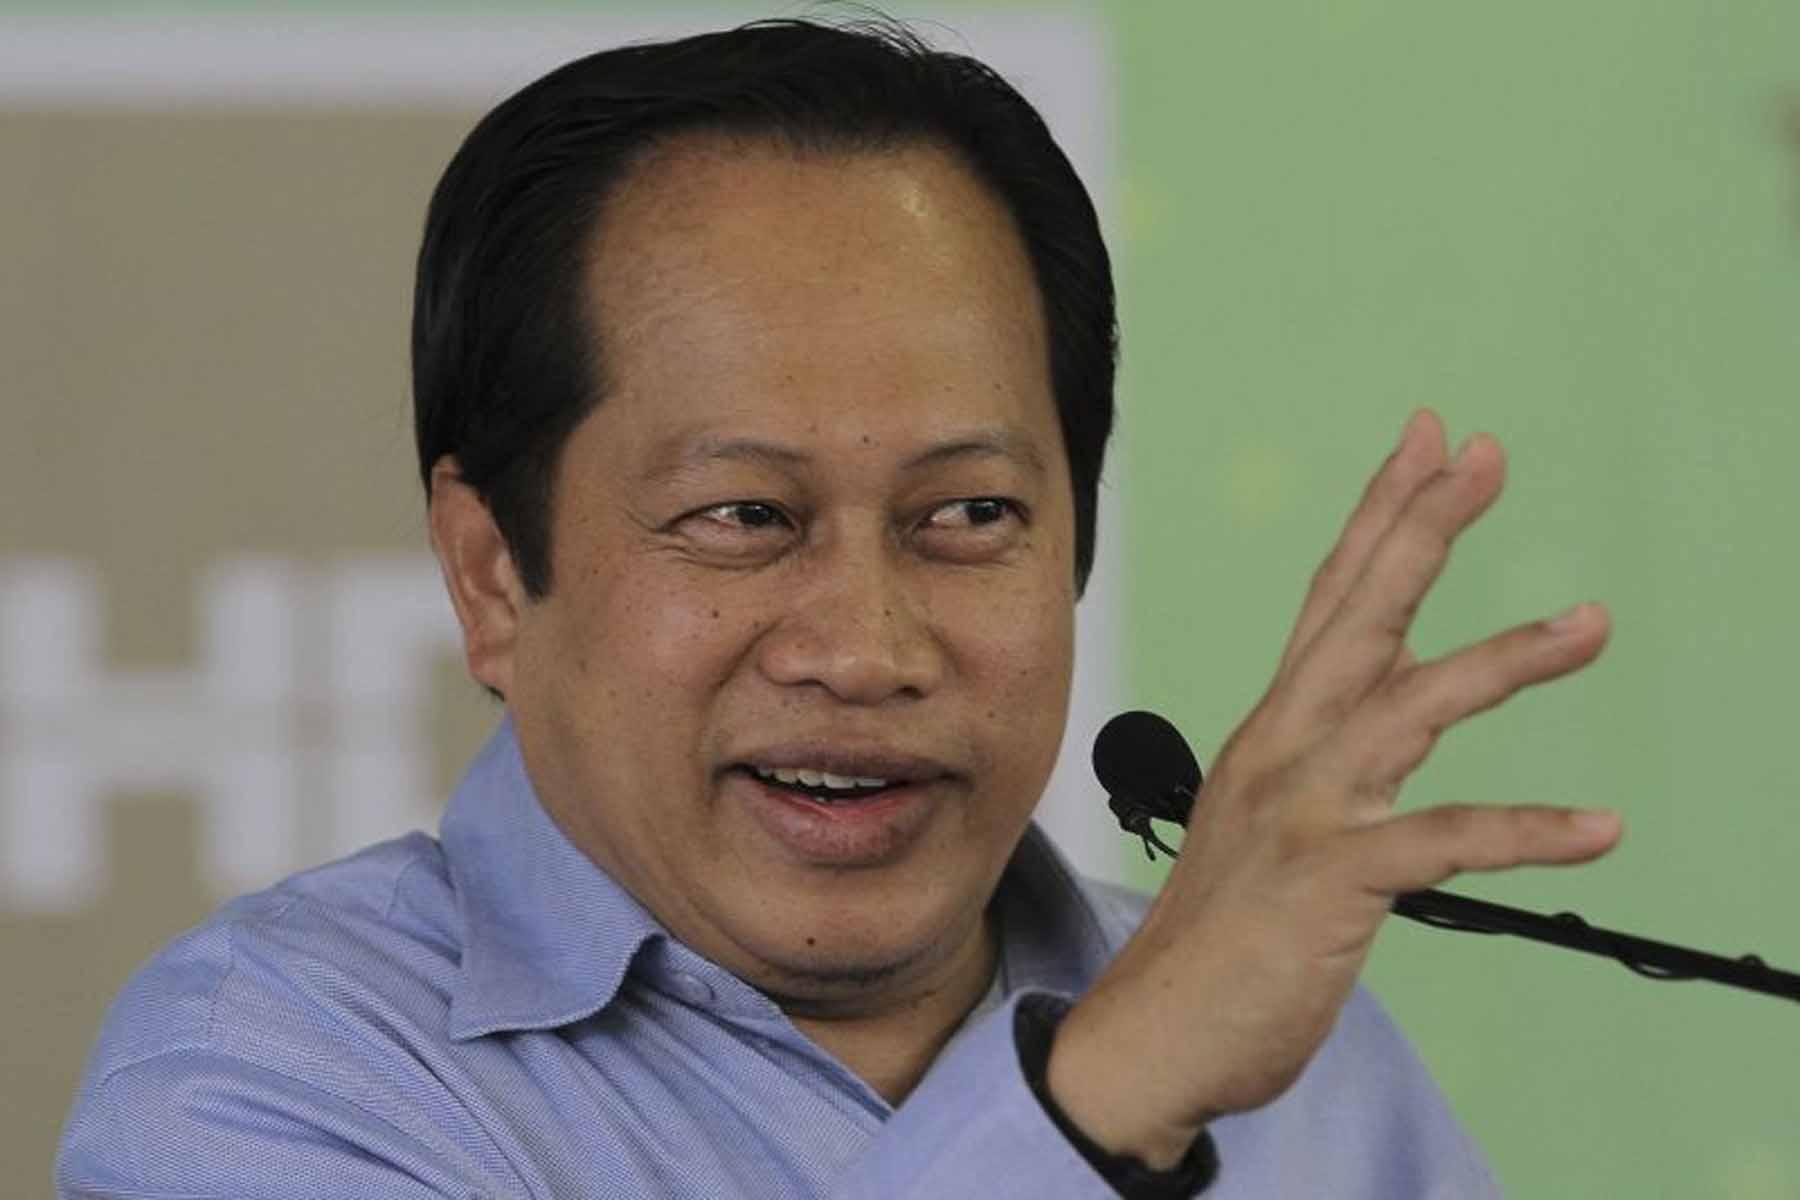 Mampukah PN mendapat mejoriti lulus Belanjawan 2021